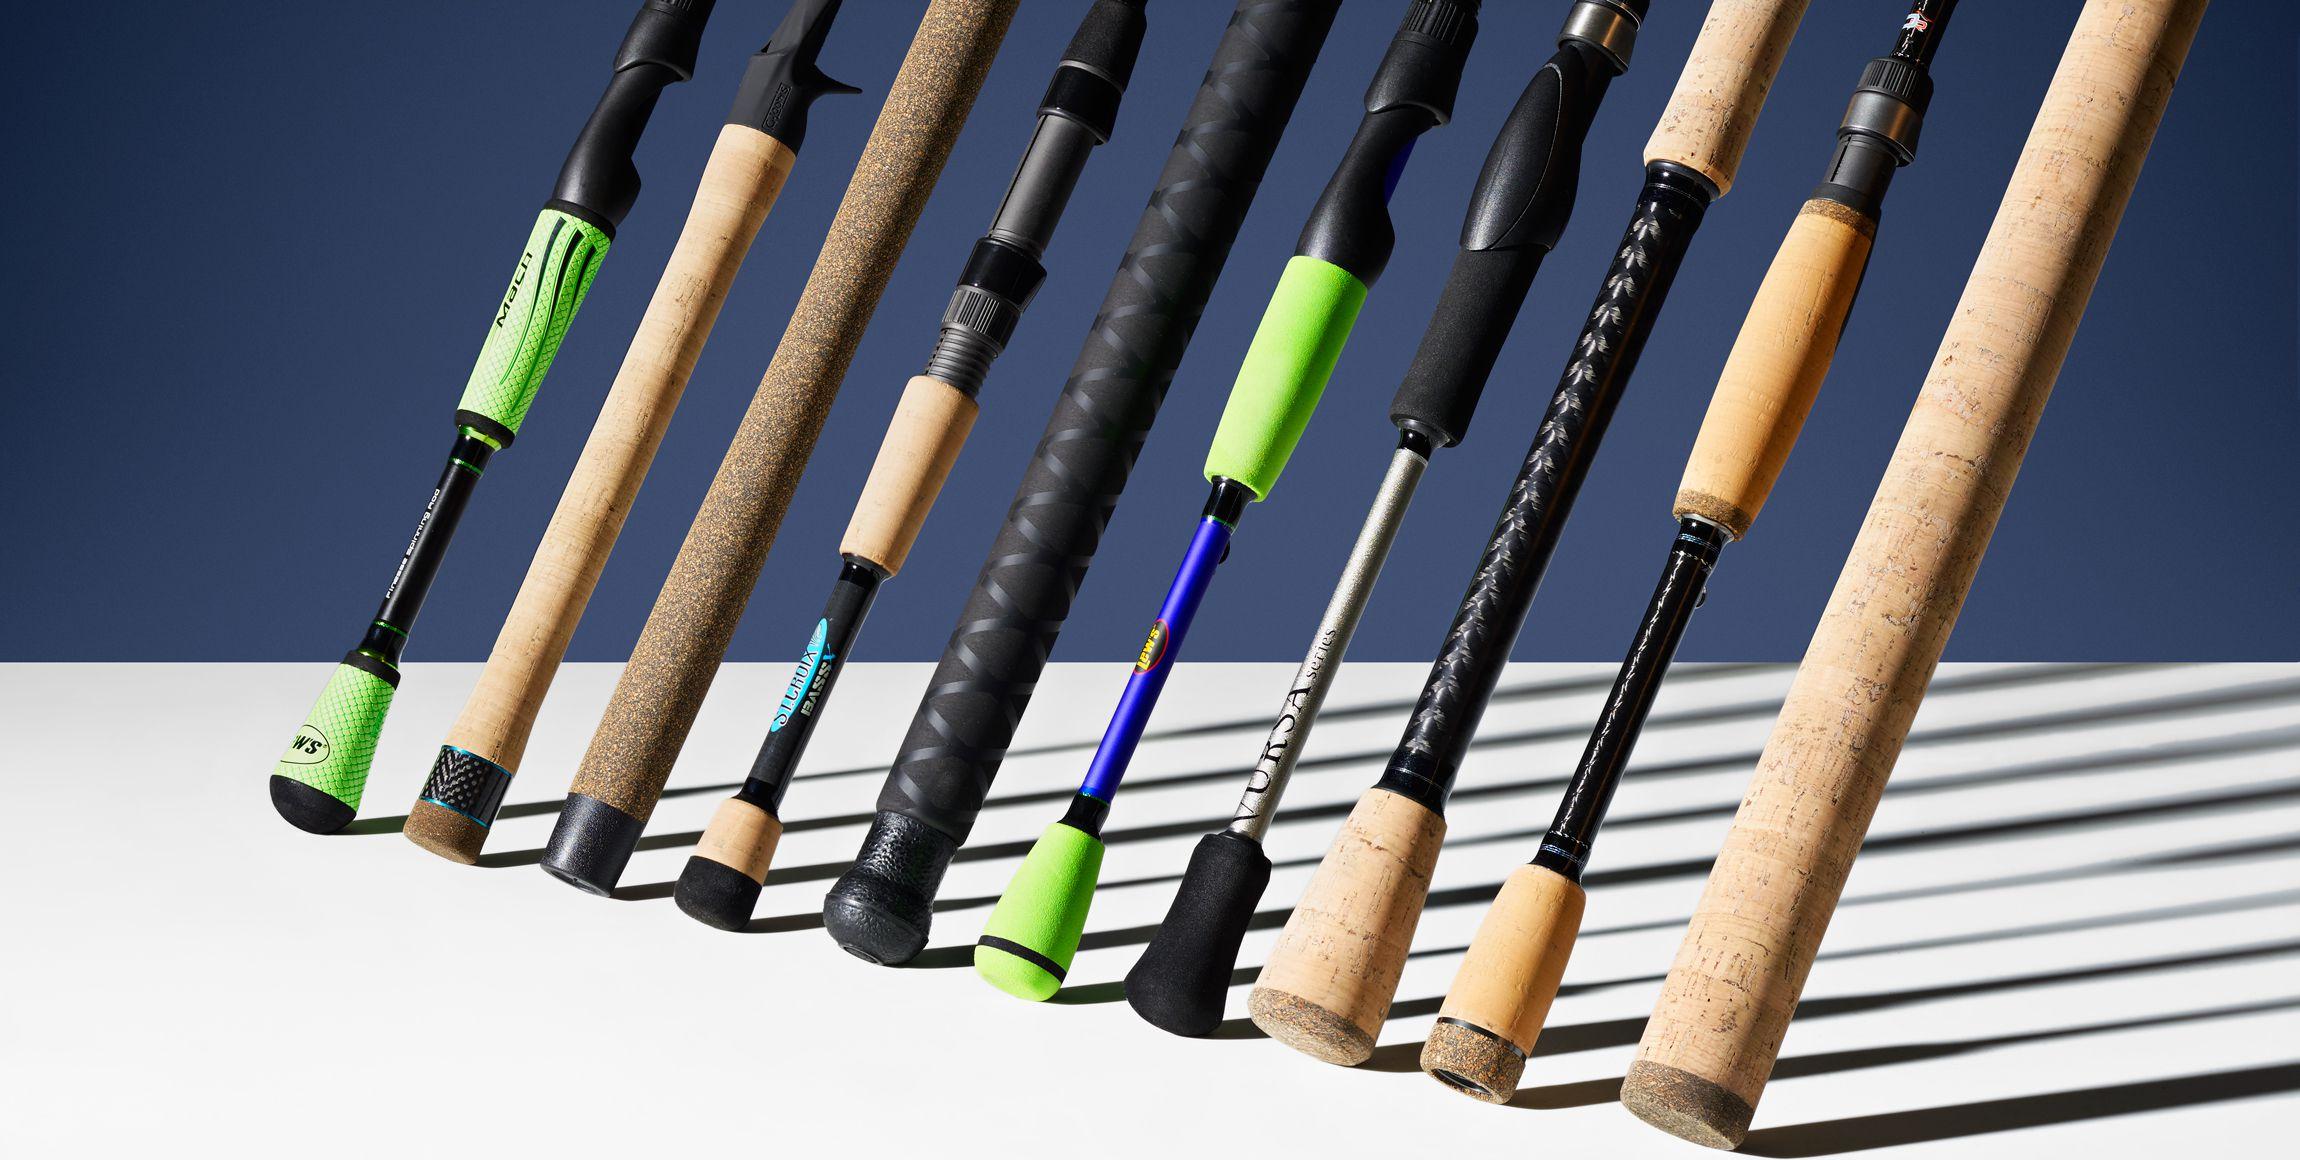 Croix Bass X Graphite Casting Fishing Rod with Split-Grip Cork Handle St